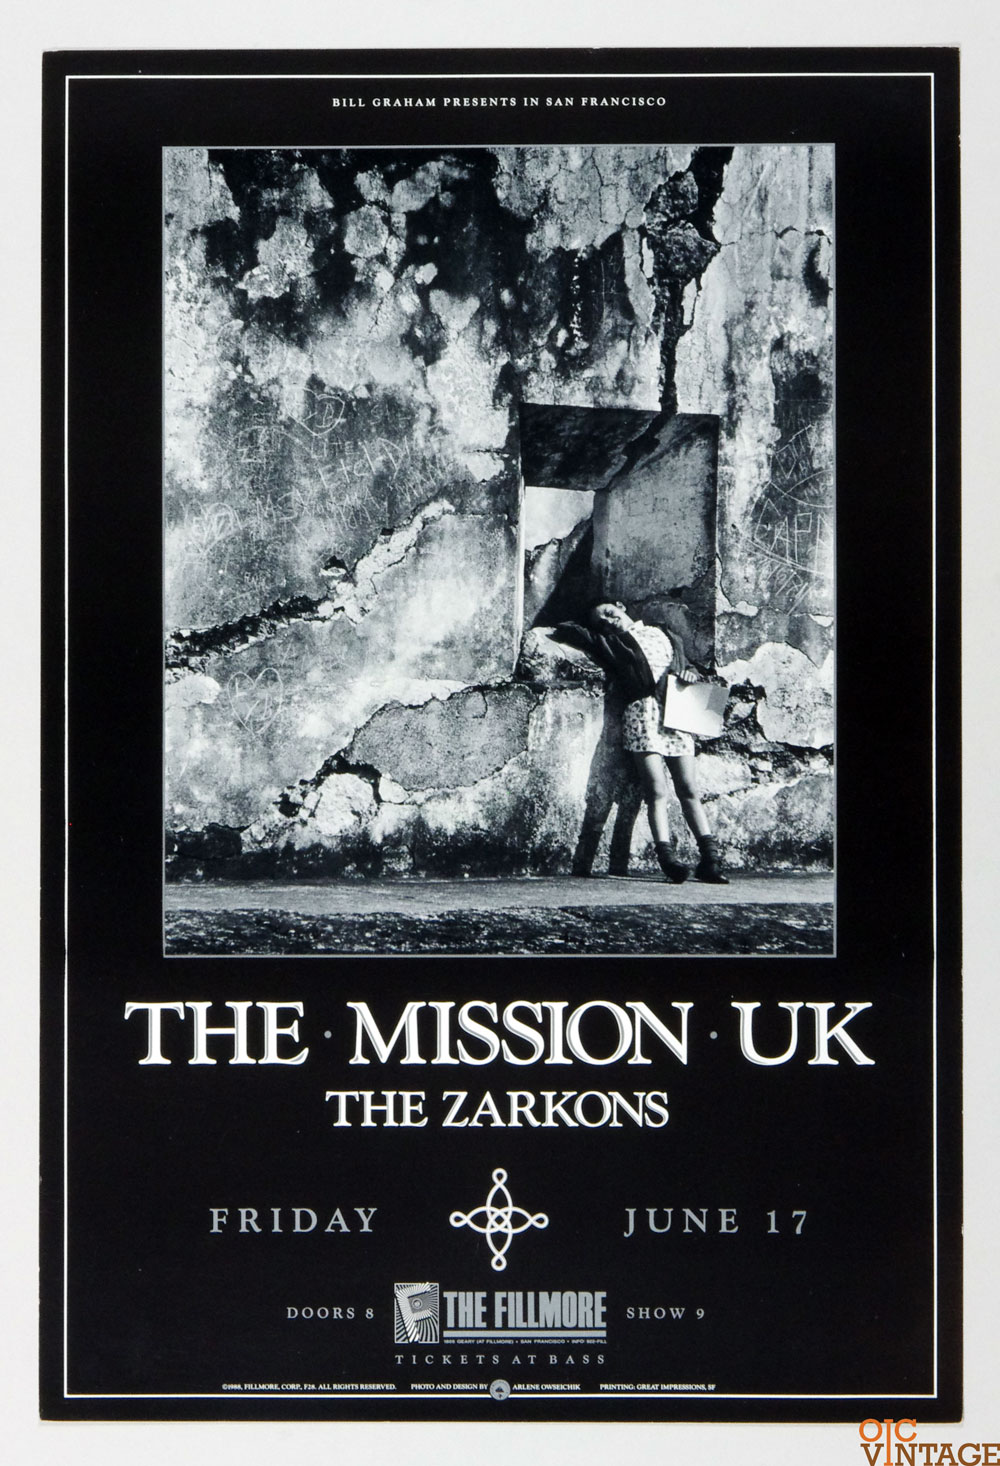 New Fillmore F028 Poster The Mission UK The Zarkons 1988 Jun 17